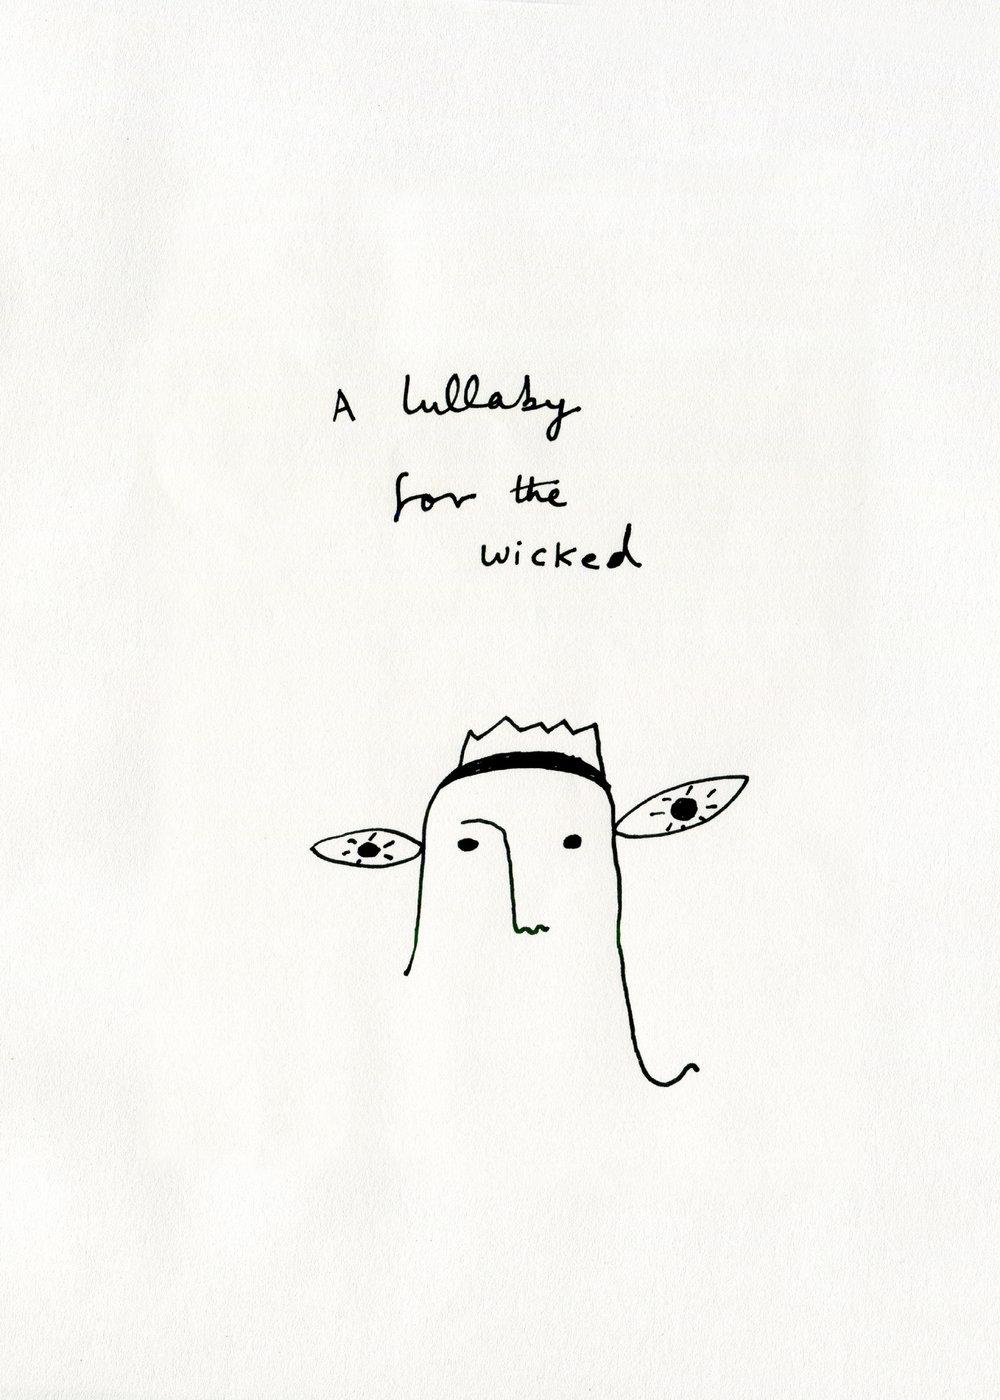 lullaby_02.JPG